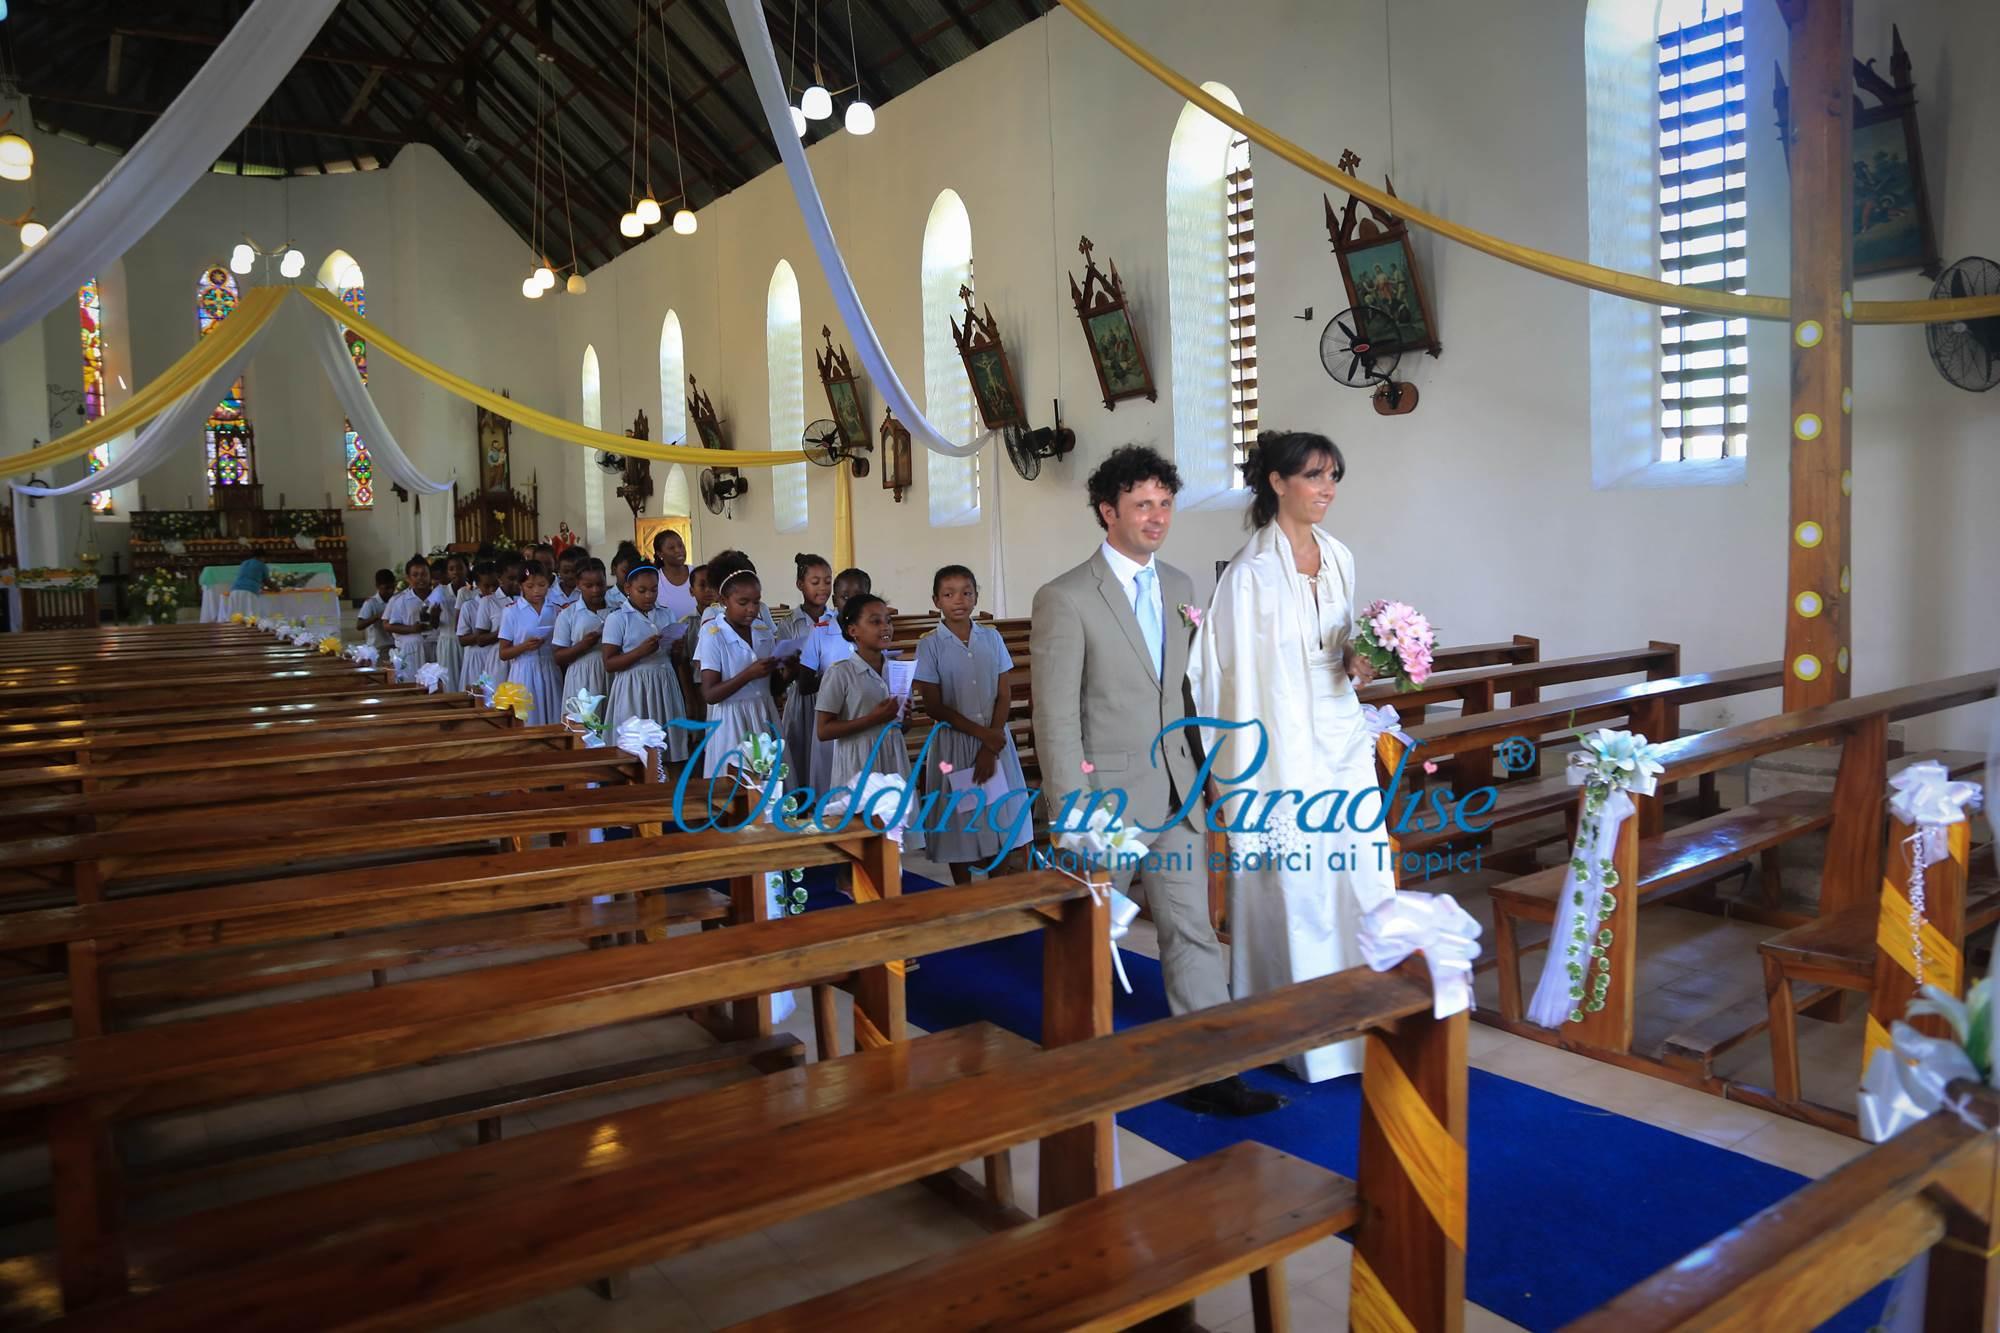 Matrimonio Simbolico Alle Seychelles : Foto matrimonio alle seychelles di francesco e alessia da roma